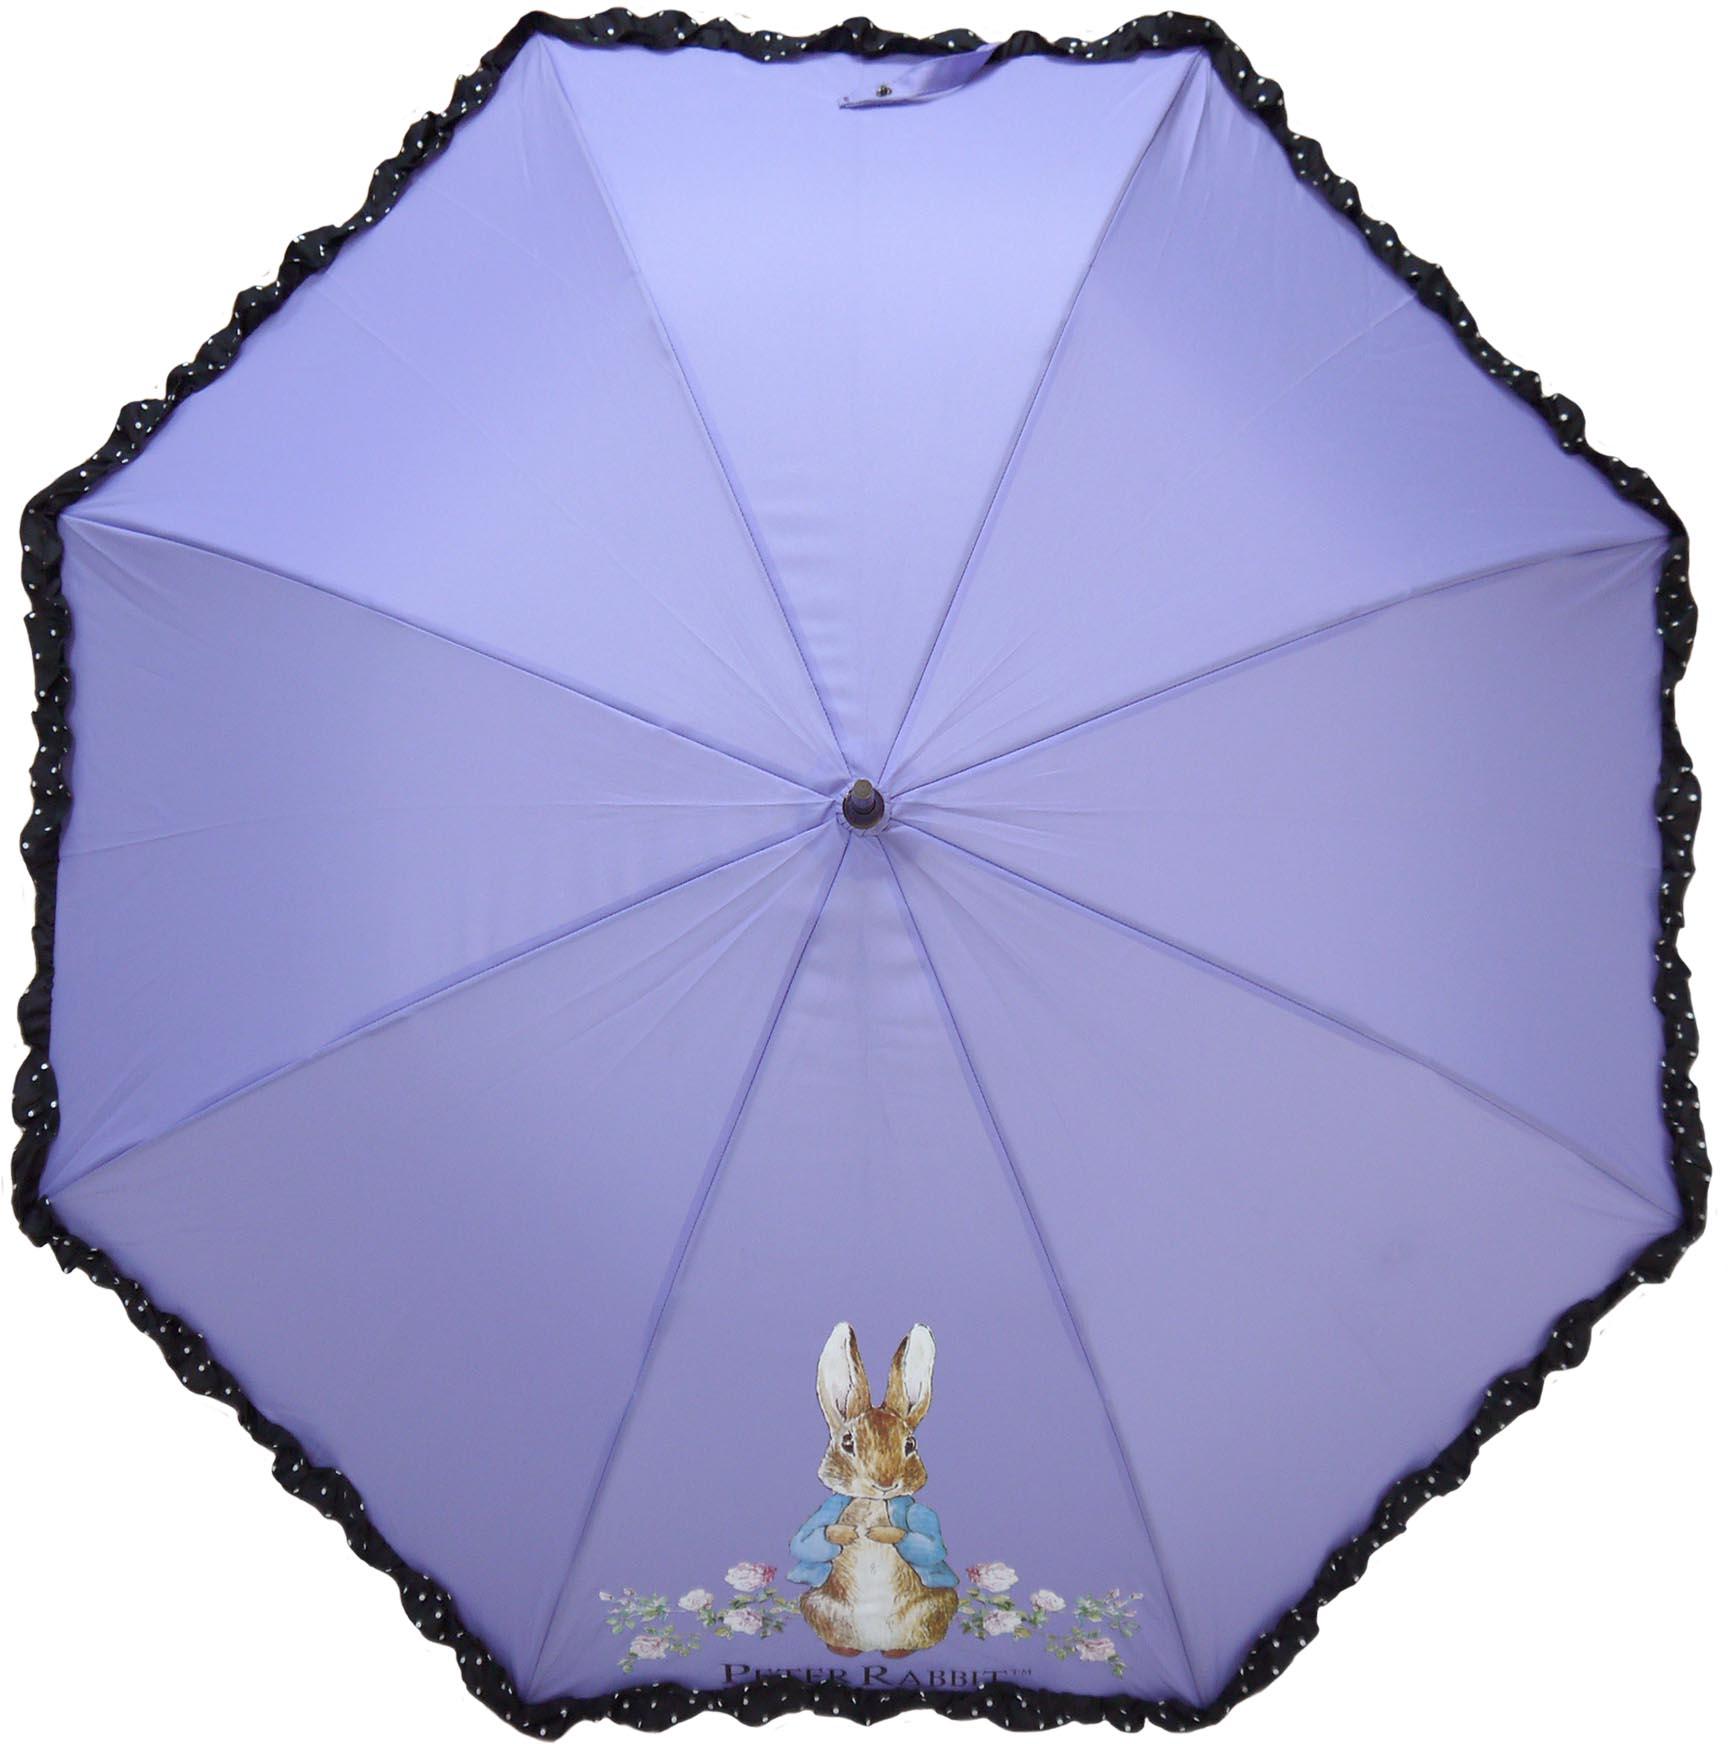 《Annie's Friends》Peter Rabbit 比得兔防曬直傘【尊貴紫玫瑰兔】